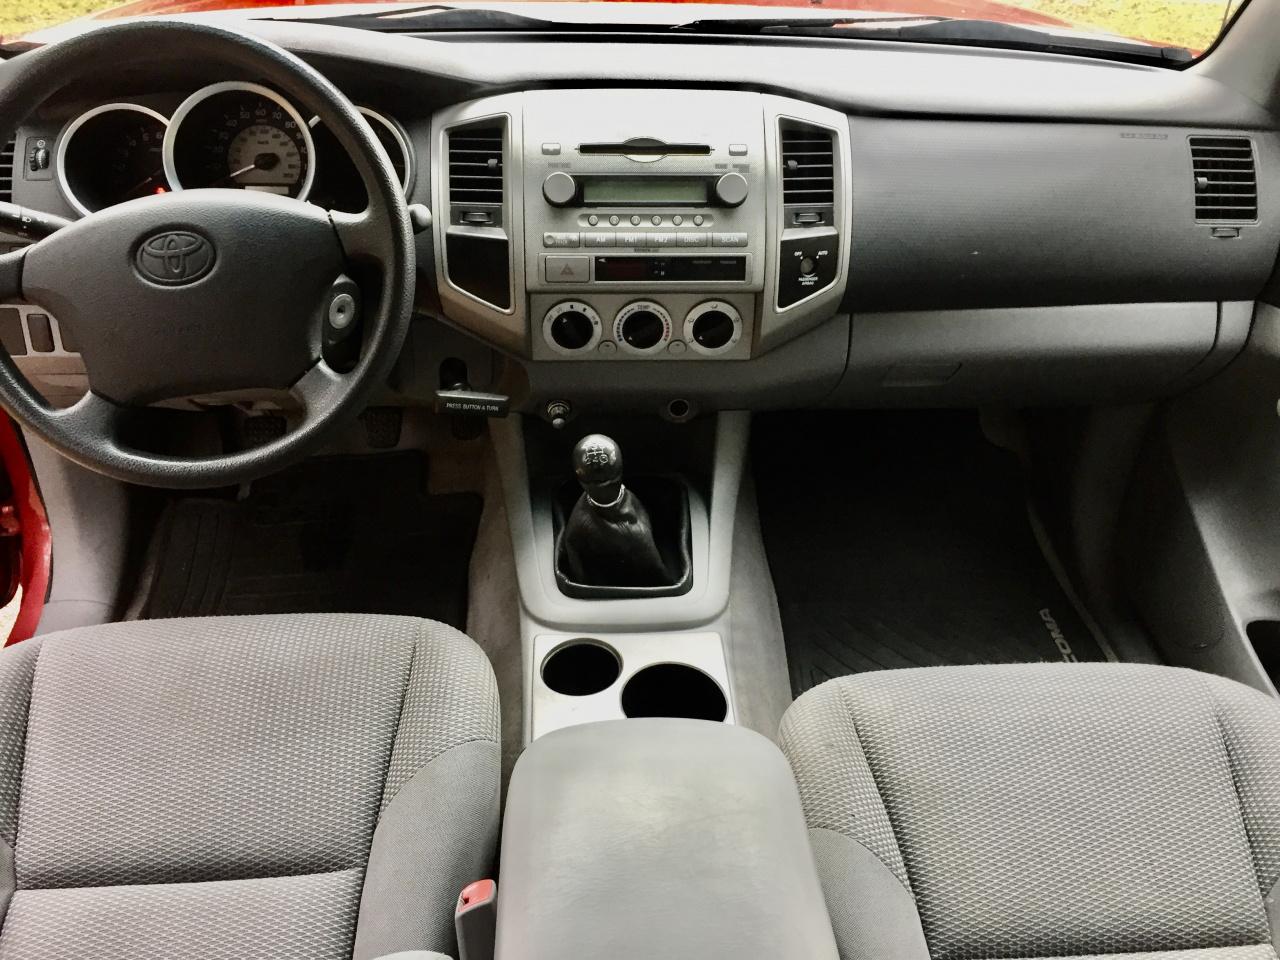 Toyota Tacoma 89k miles-e41a8041-aee8-41aa-bae2-978fa80f1fa9_1_201_a-jpg